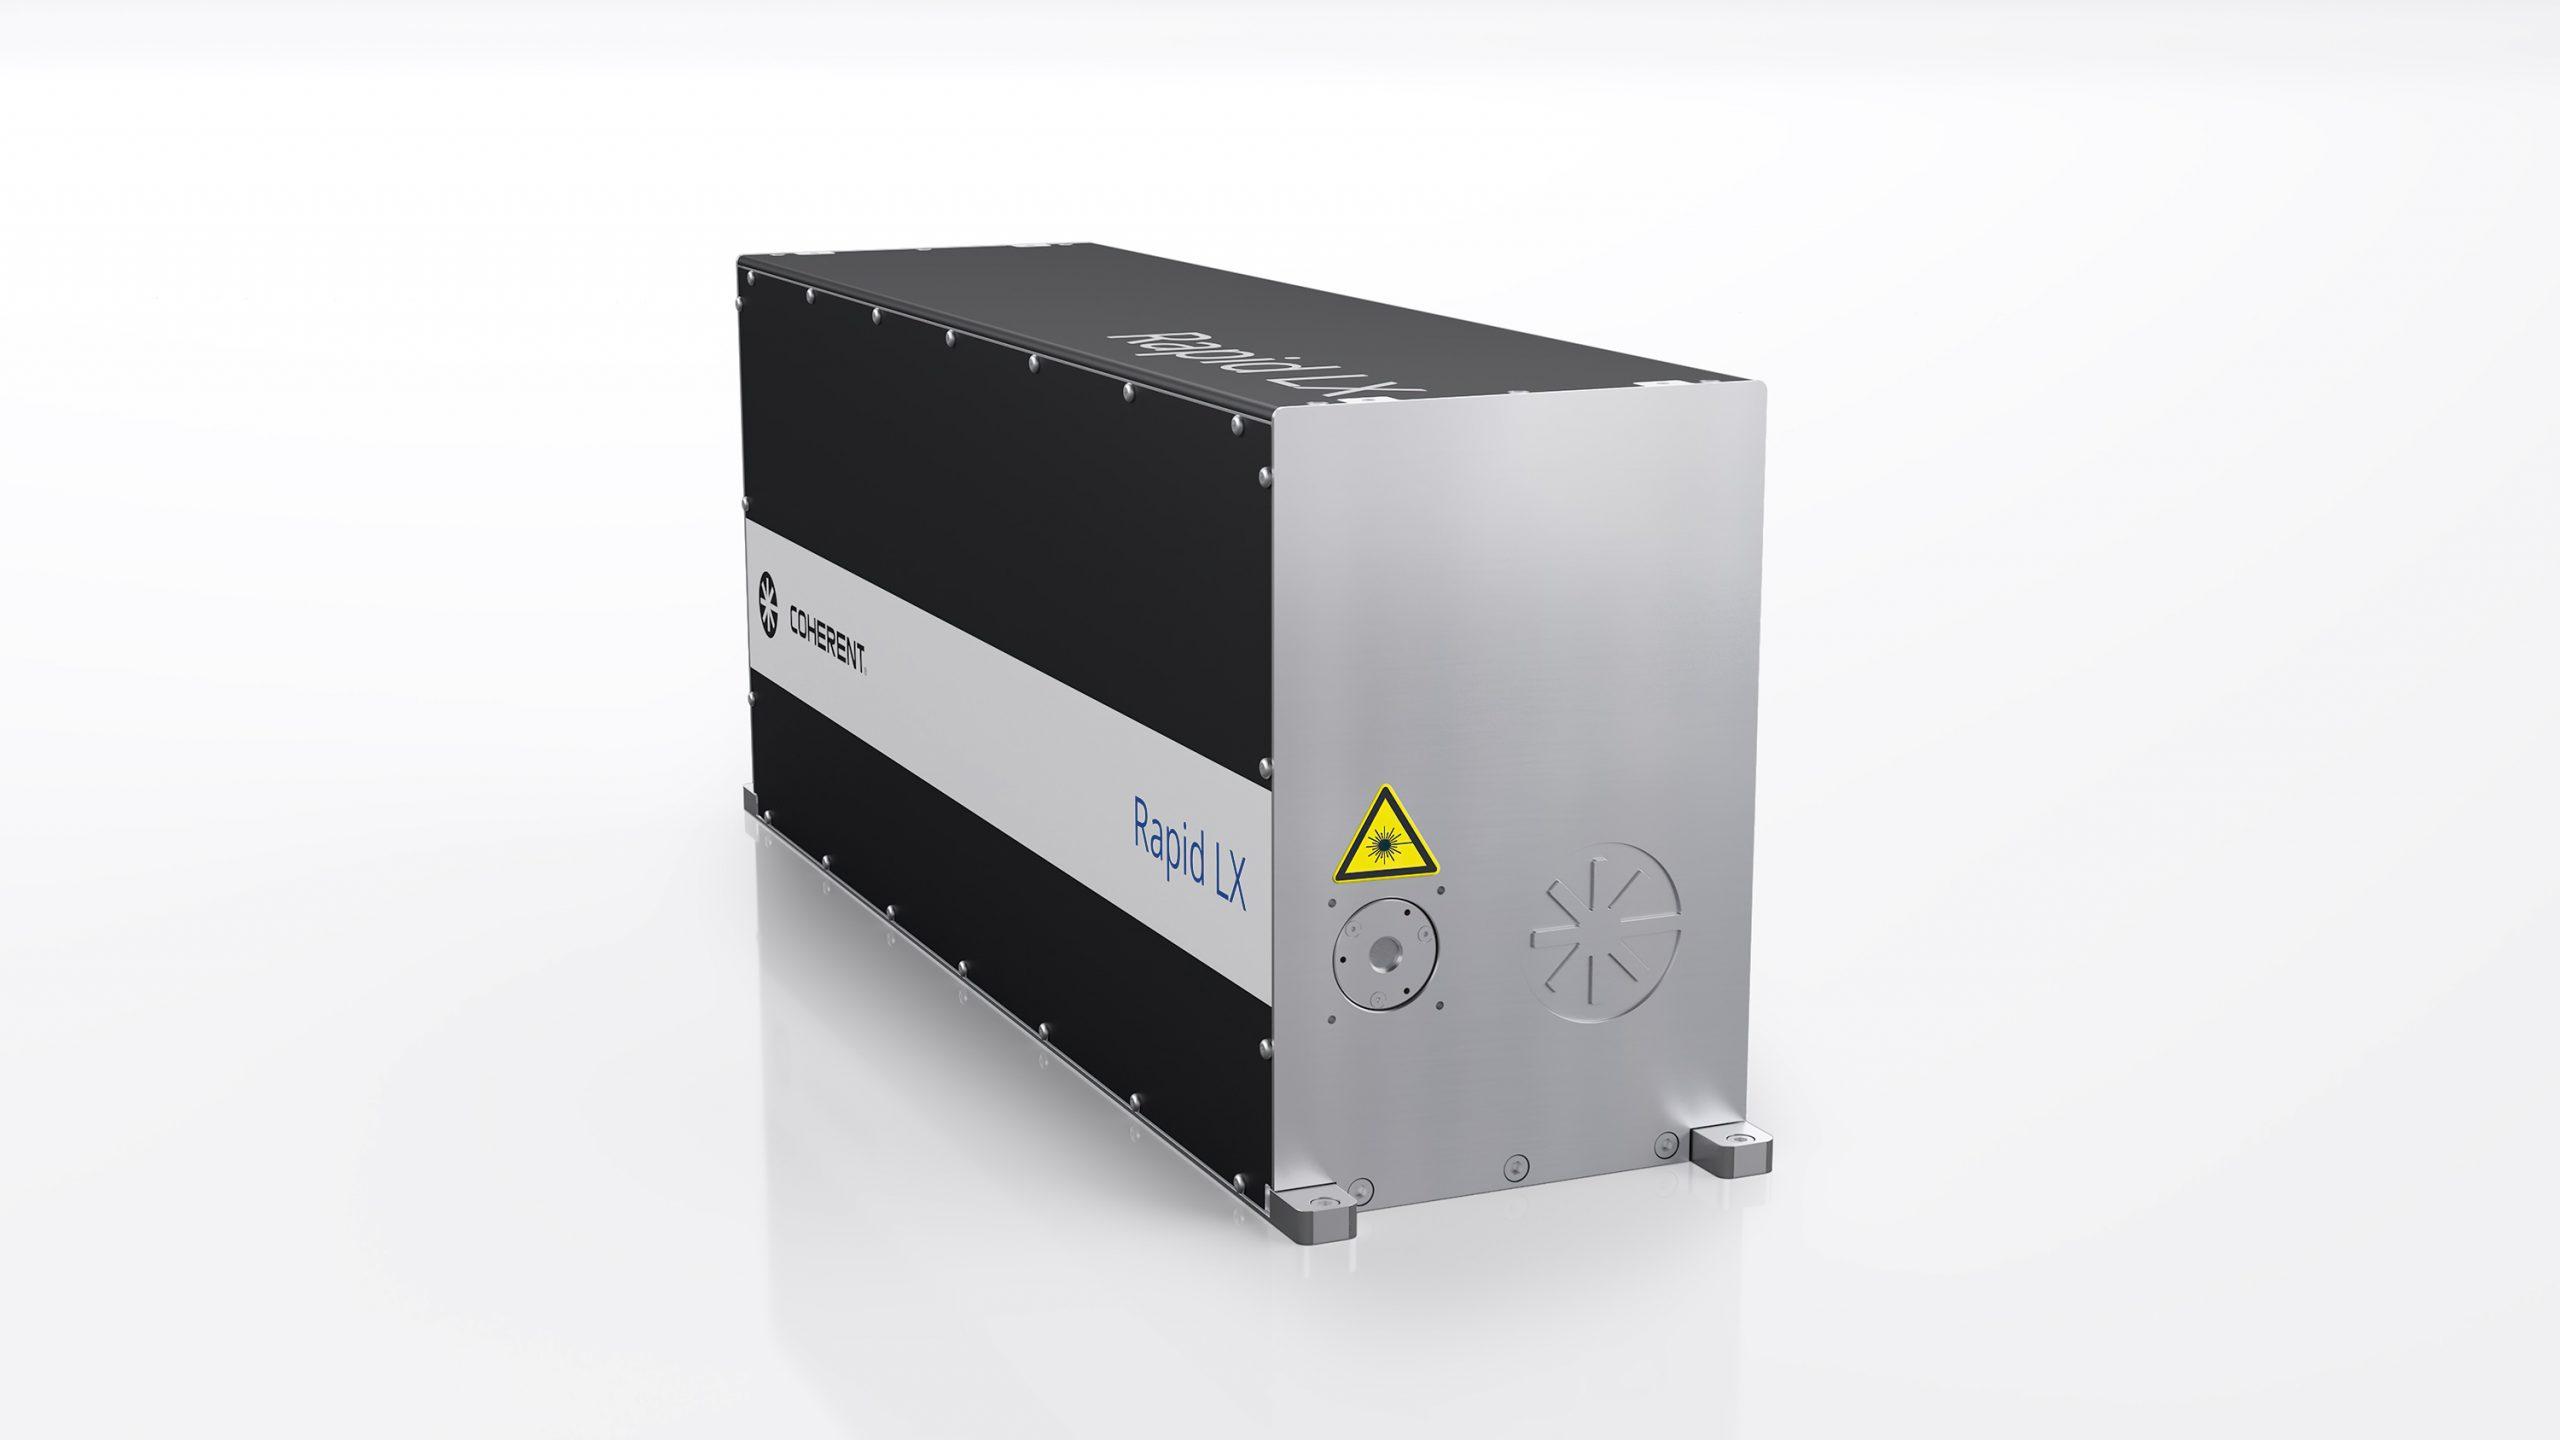 Coherent Rapid LX Laser